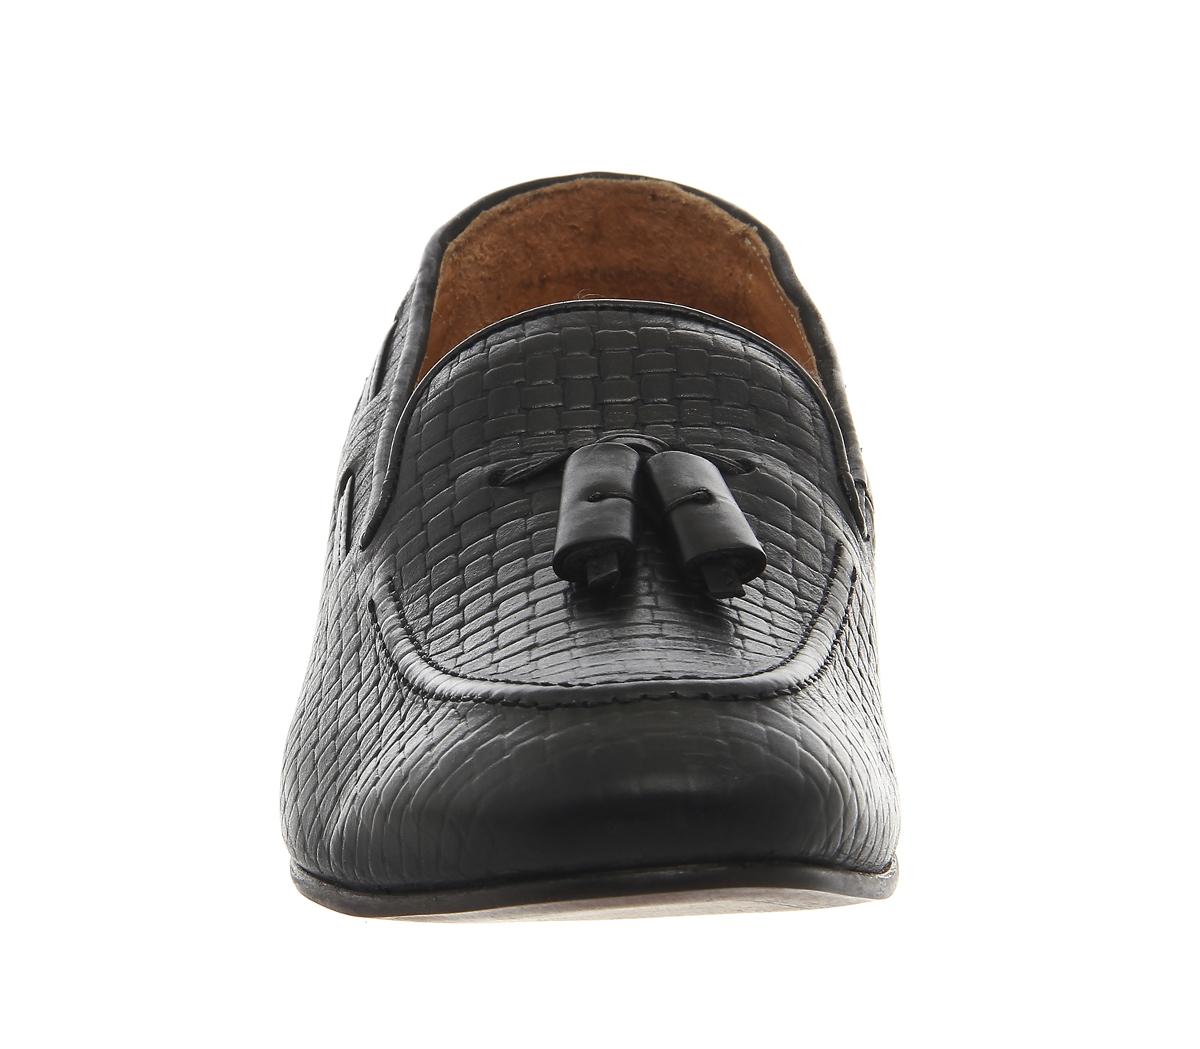 h by hudson piere loafers in black for men lyst. Black Bedroom Furniture Sets. Home Design Ideas